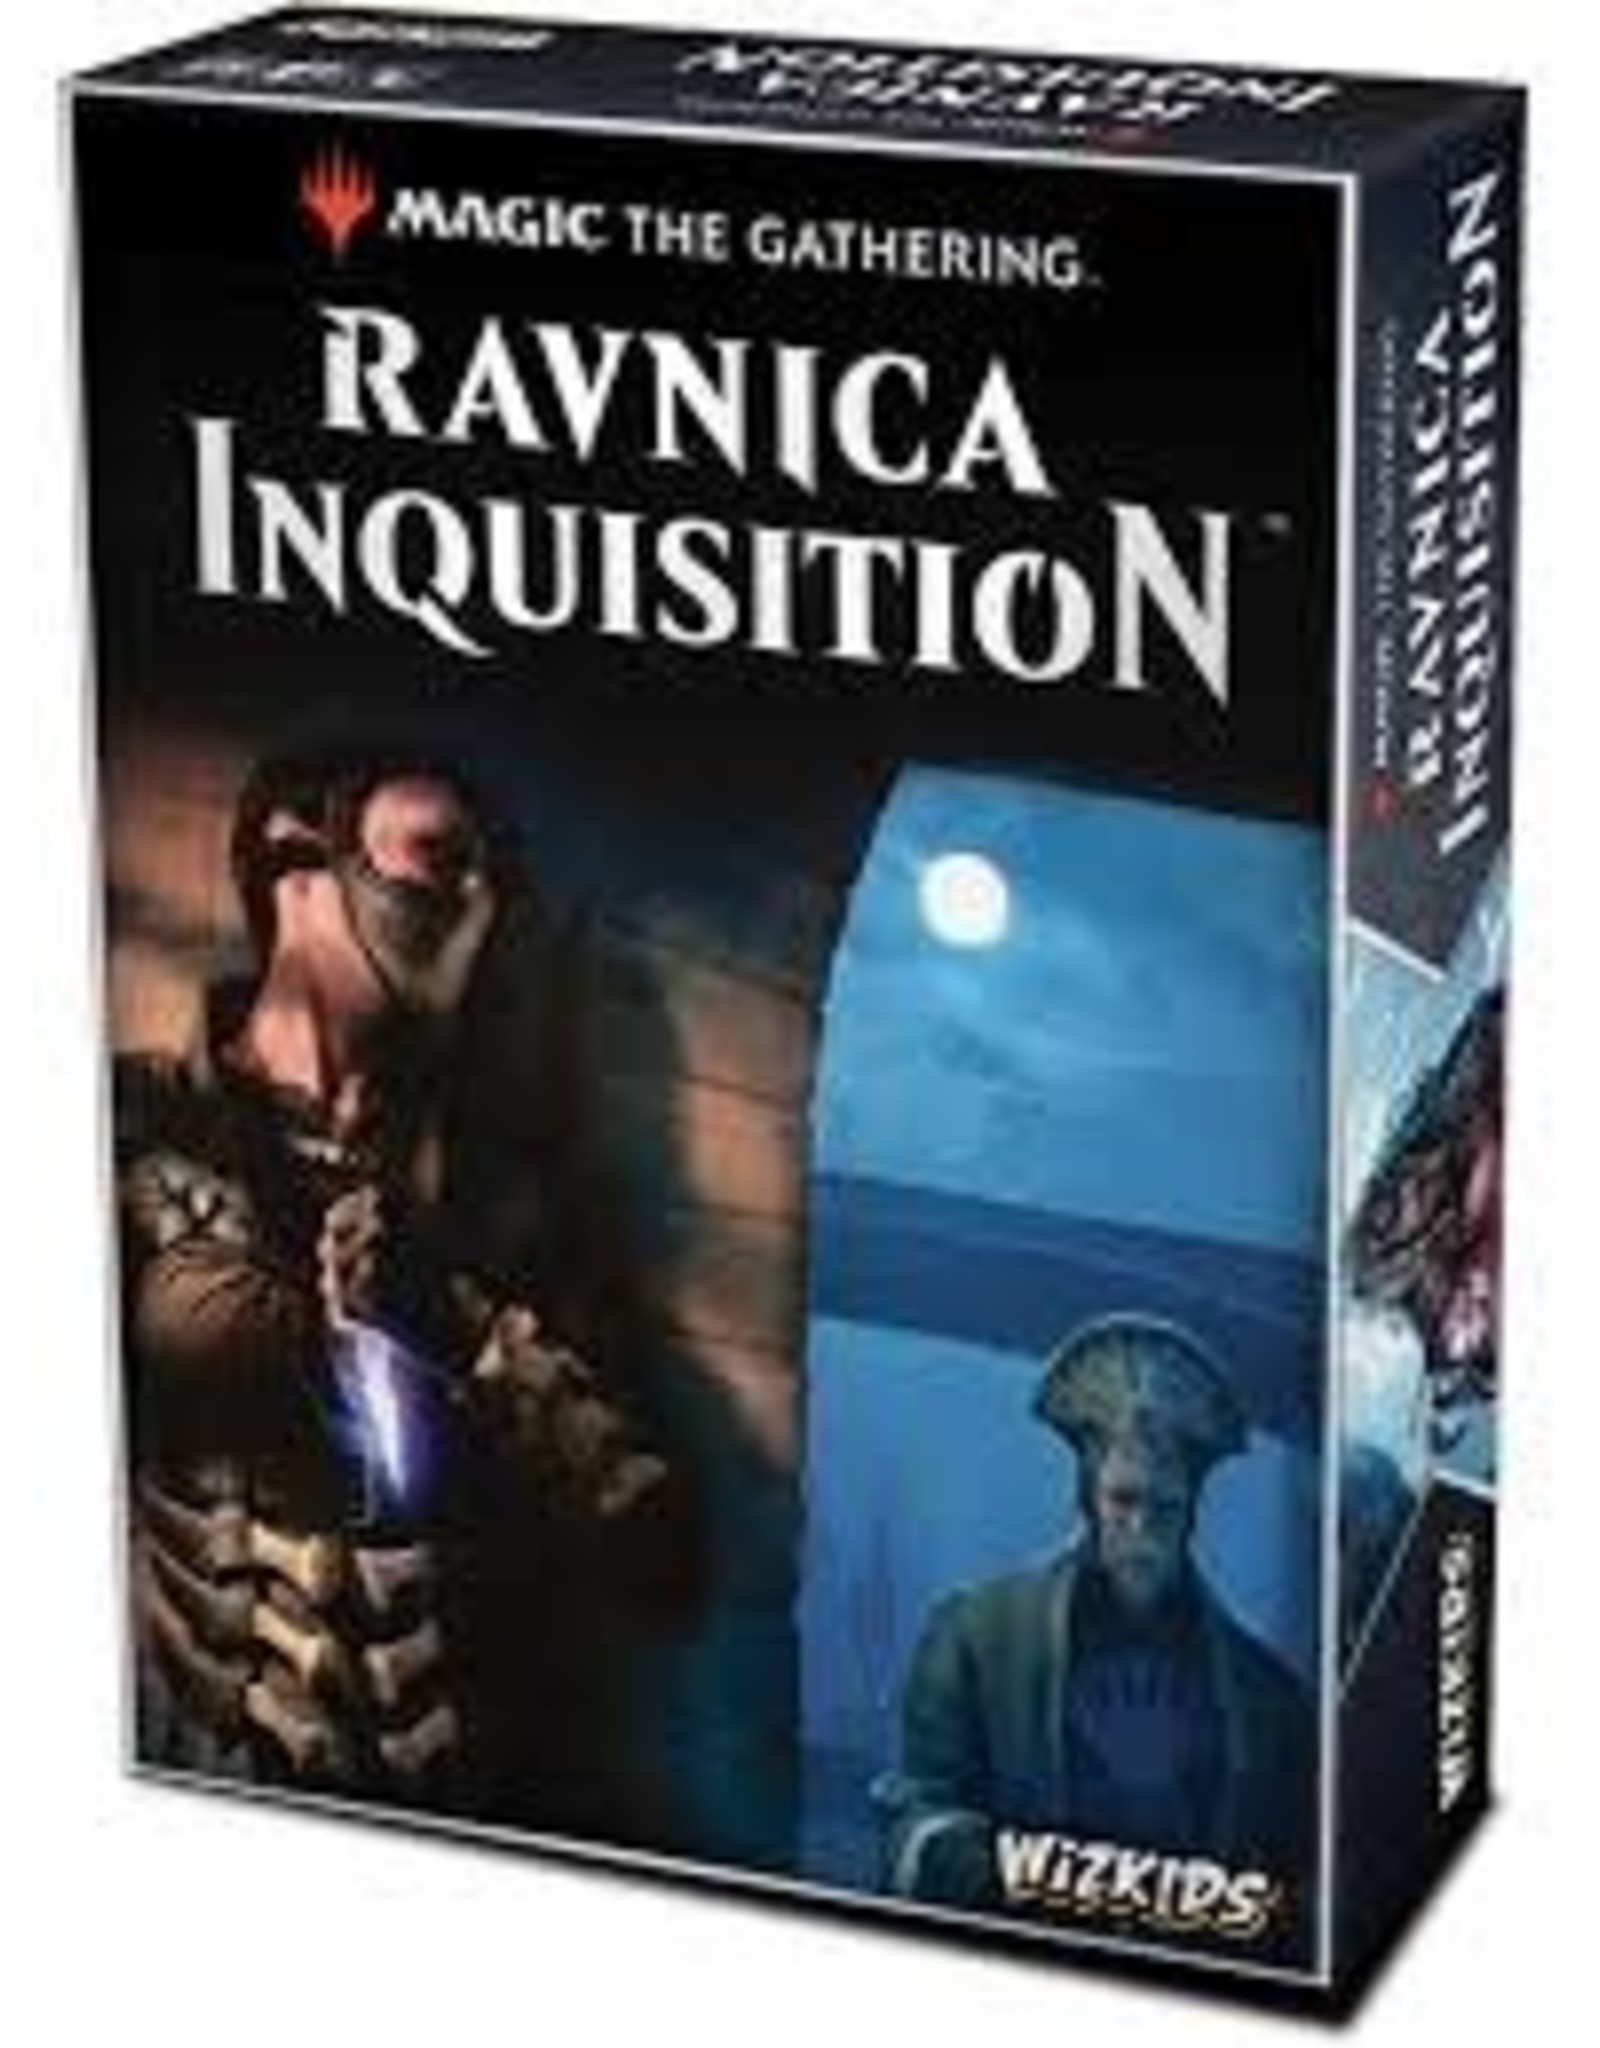 WIZKIDS RAVNICA INQUISITION (English)